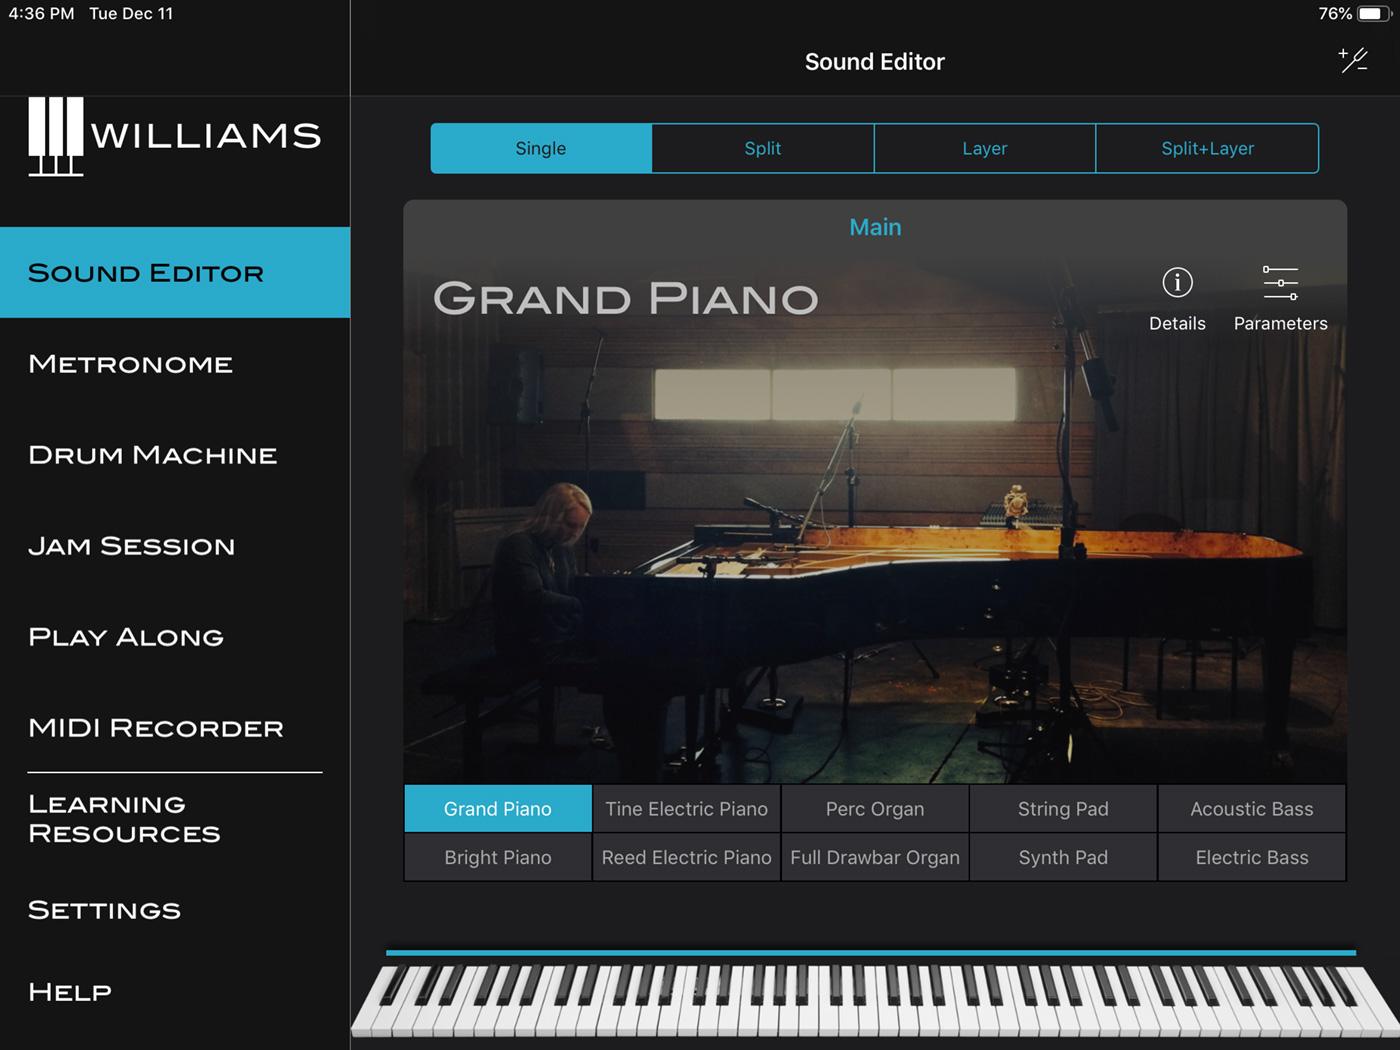 Williams App Sound Editor iPad